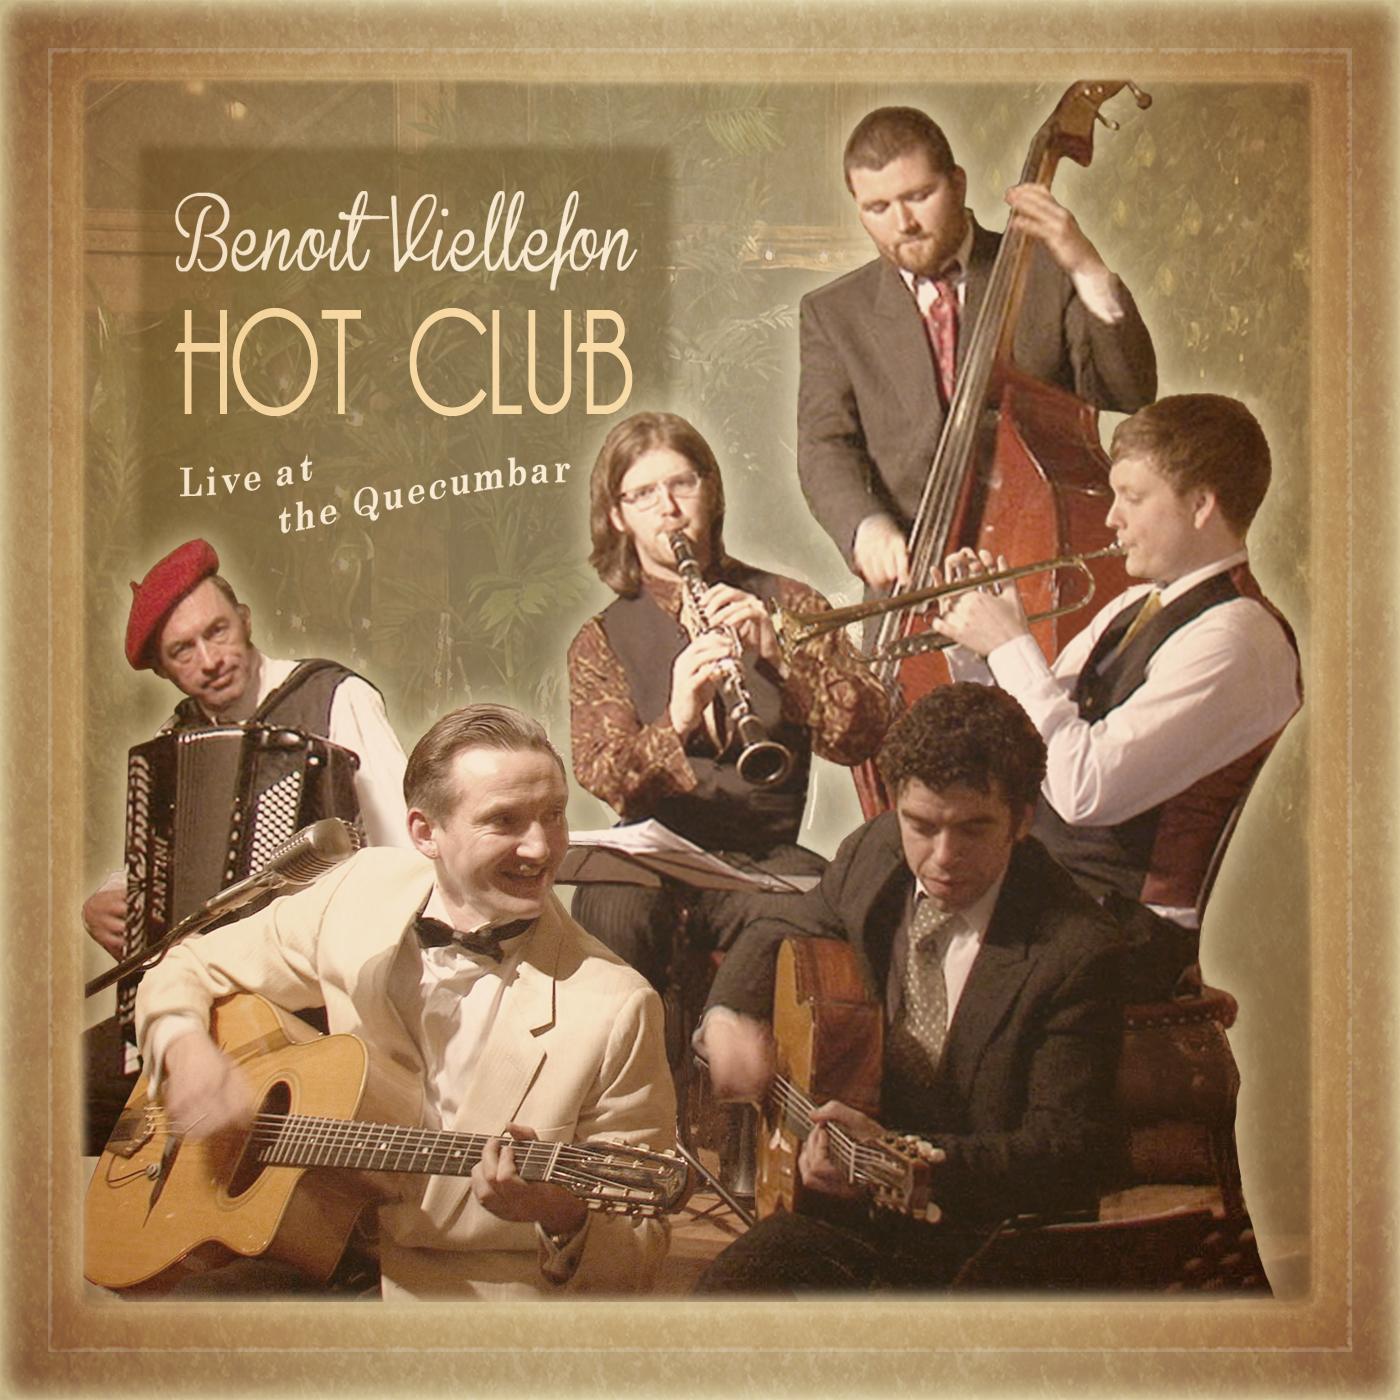 "The Hot Club - ""Live at the Quecumbar"" ( CD Limited Edition ) - Benoit Viellefon"